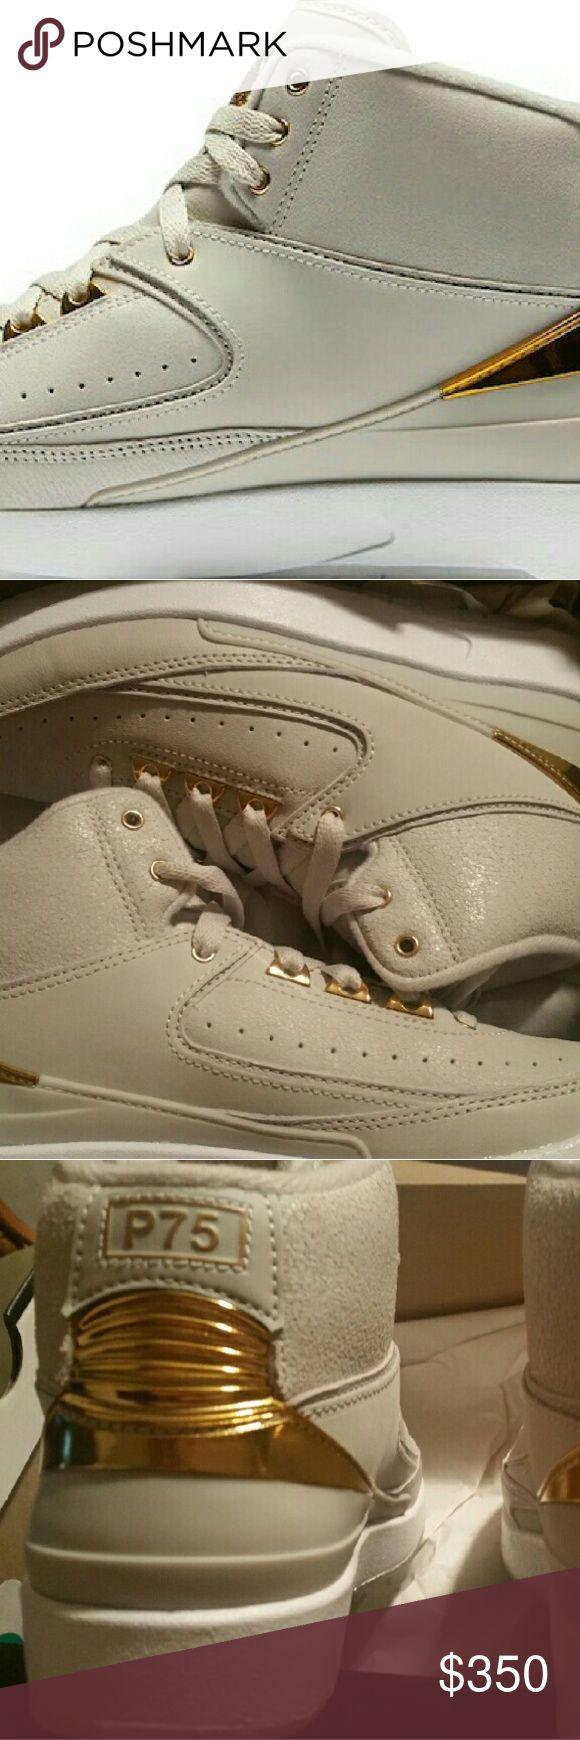 Jordan retro 2 quai 54 size 3.5y Jordan retro 2 quai 54 size 3.5y brand w/retail receipt Europe exclusive. .never released in the U.S limited sneaker Jordan Shoes Sneakers